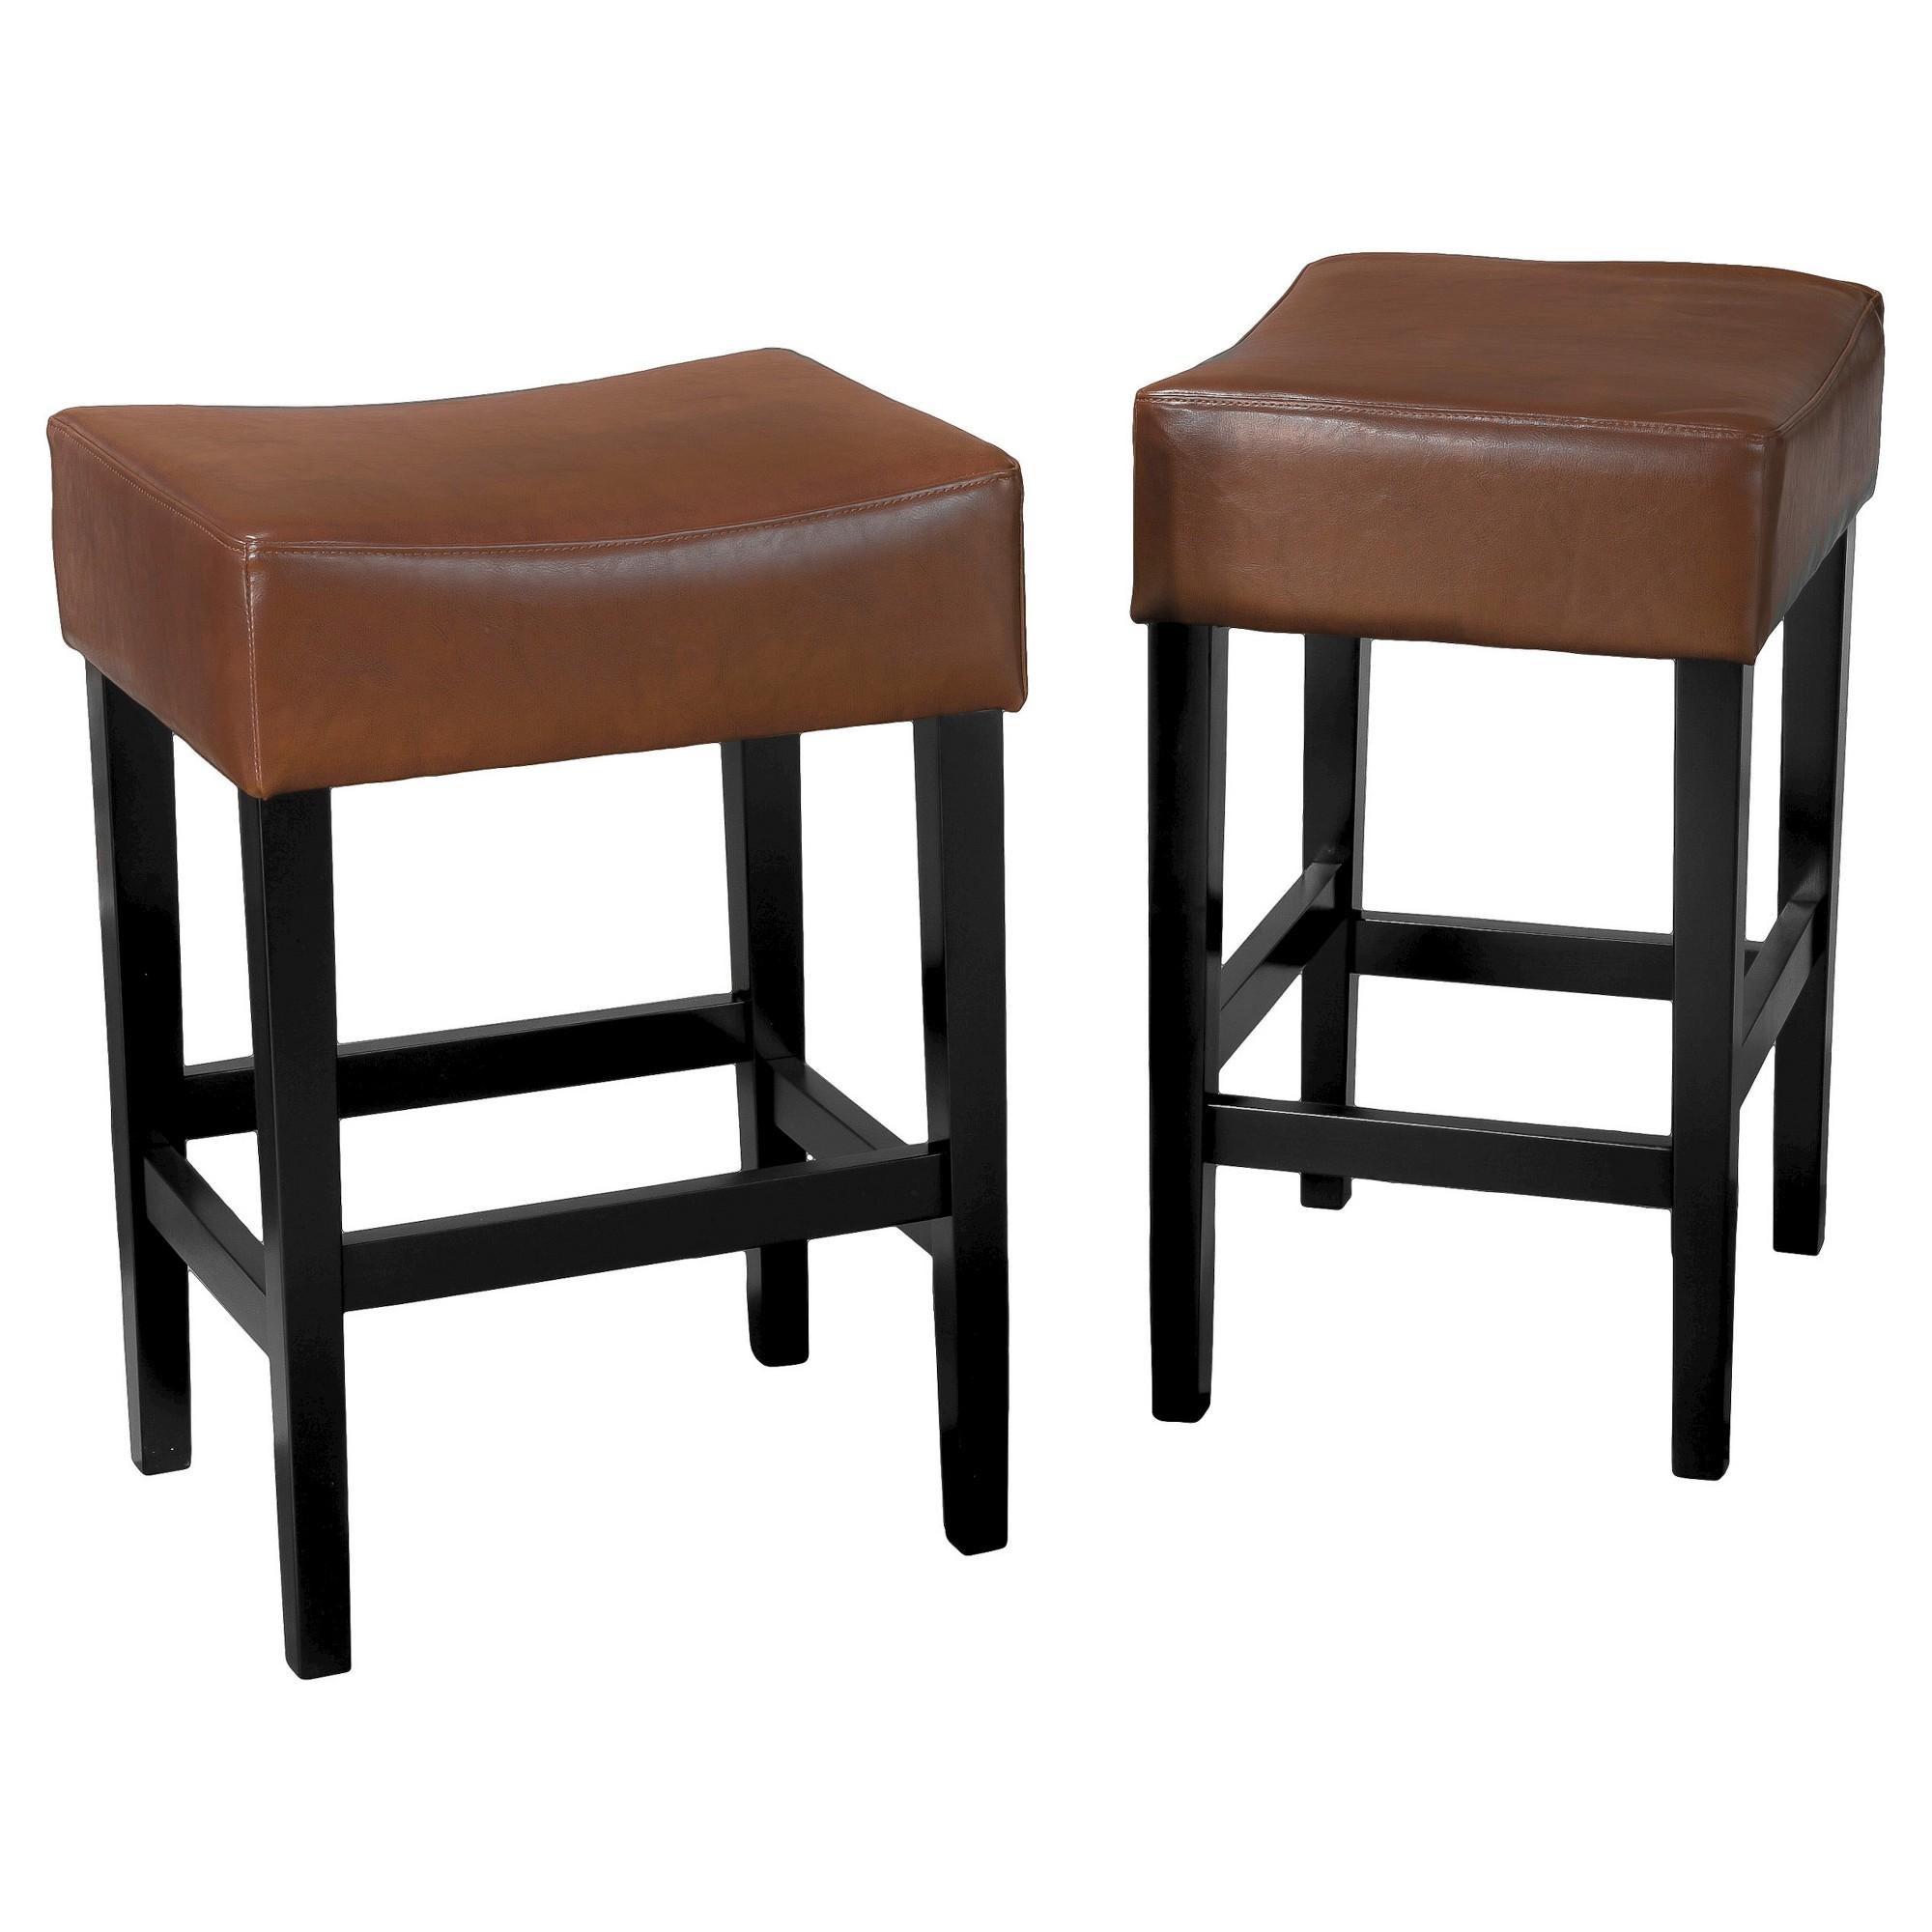 Lopez Backless Leather 25 5 Counter Stool Hazelnut Set Of 2 Christopher Knight Home Light Leather Counter Stools Counter Stools Backless Counter Stools